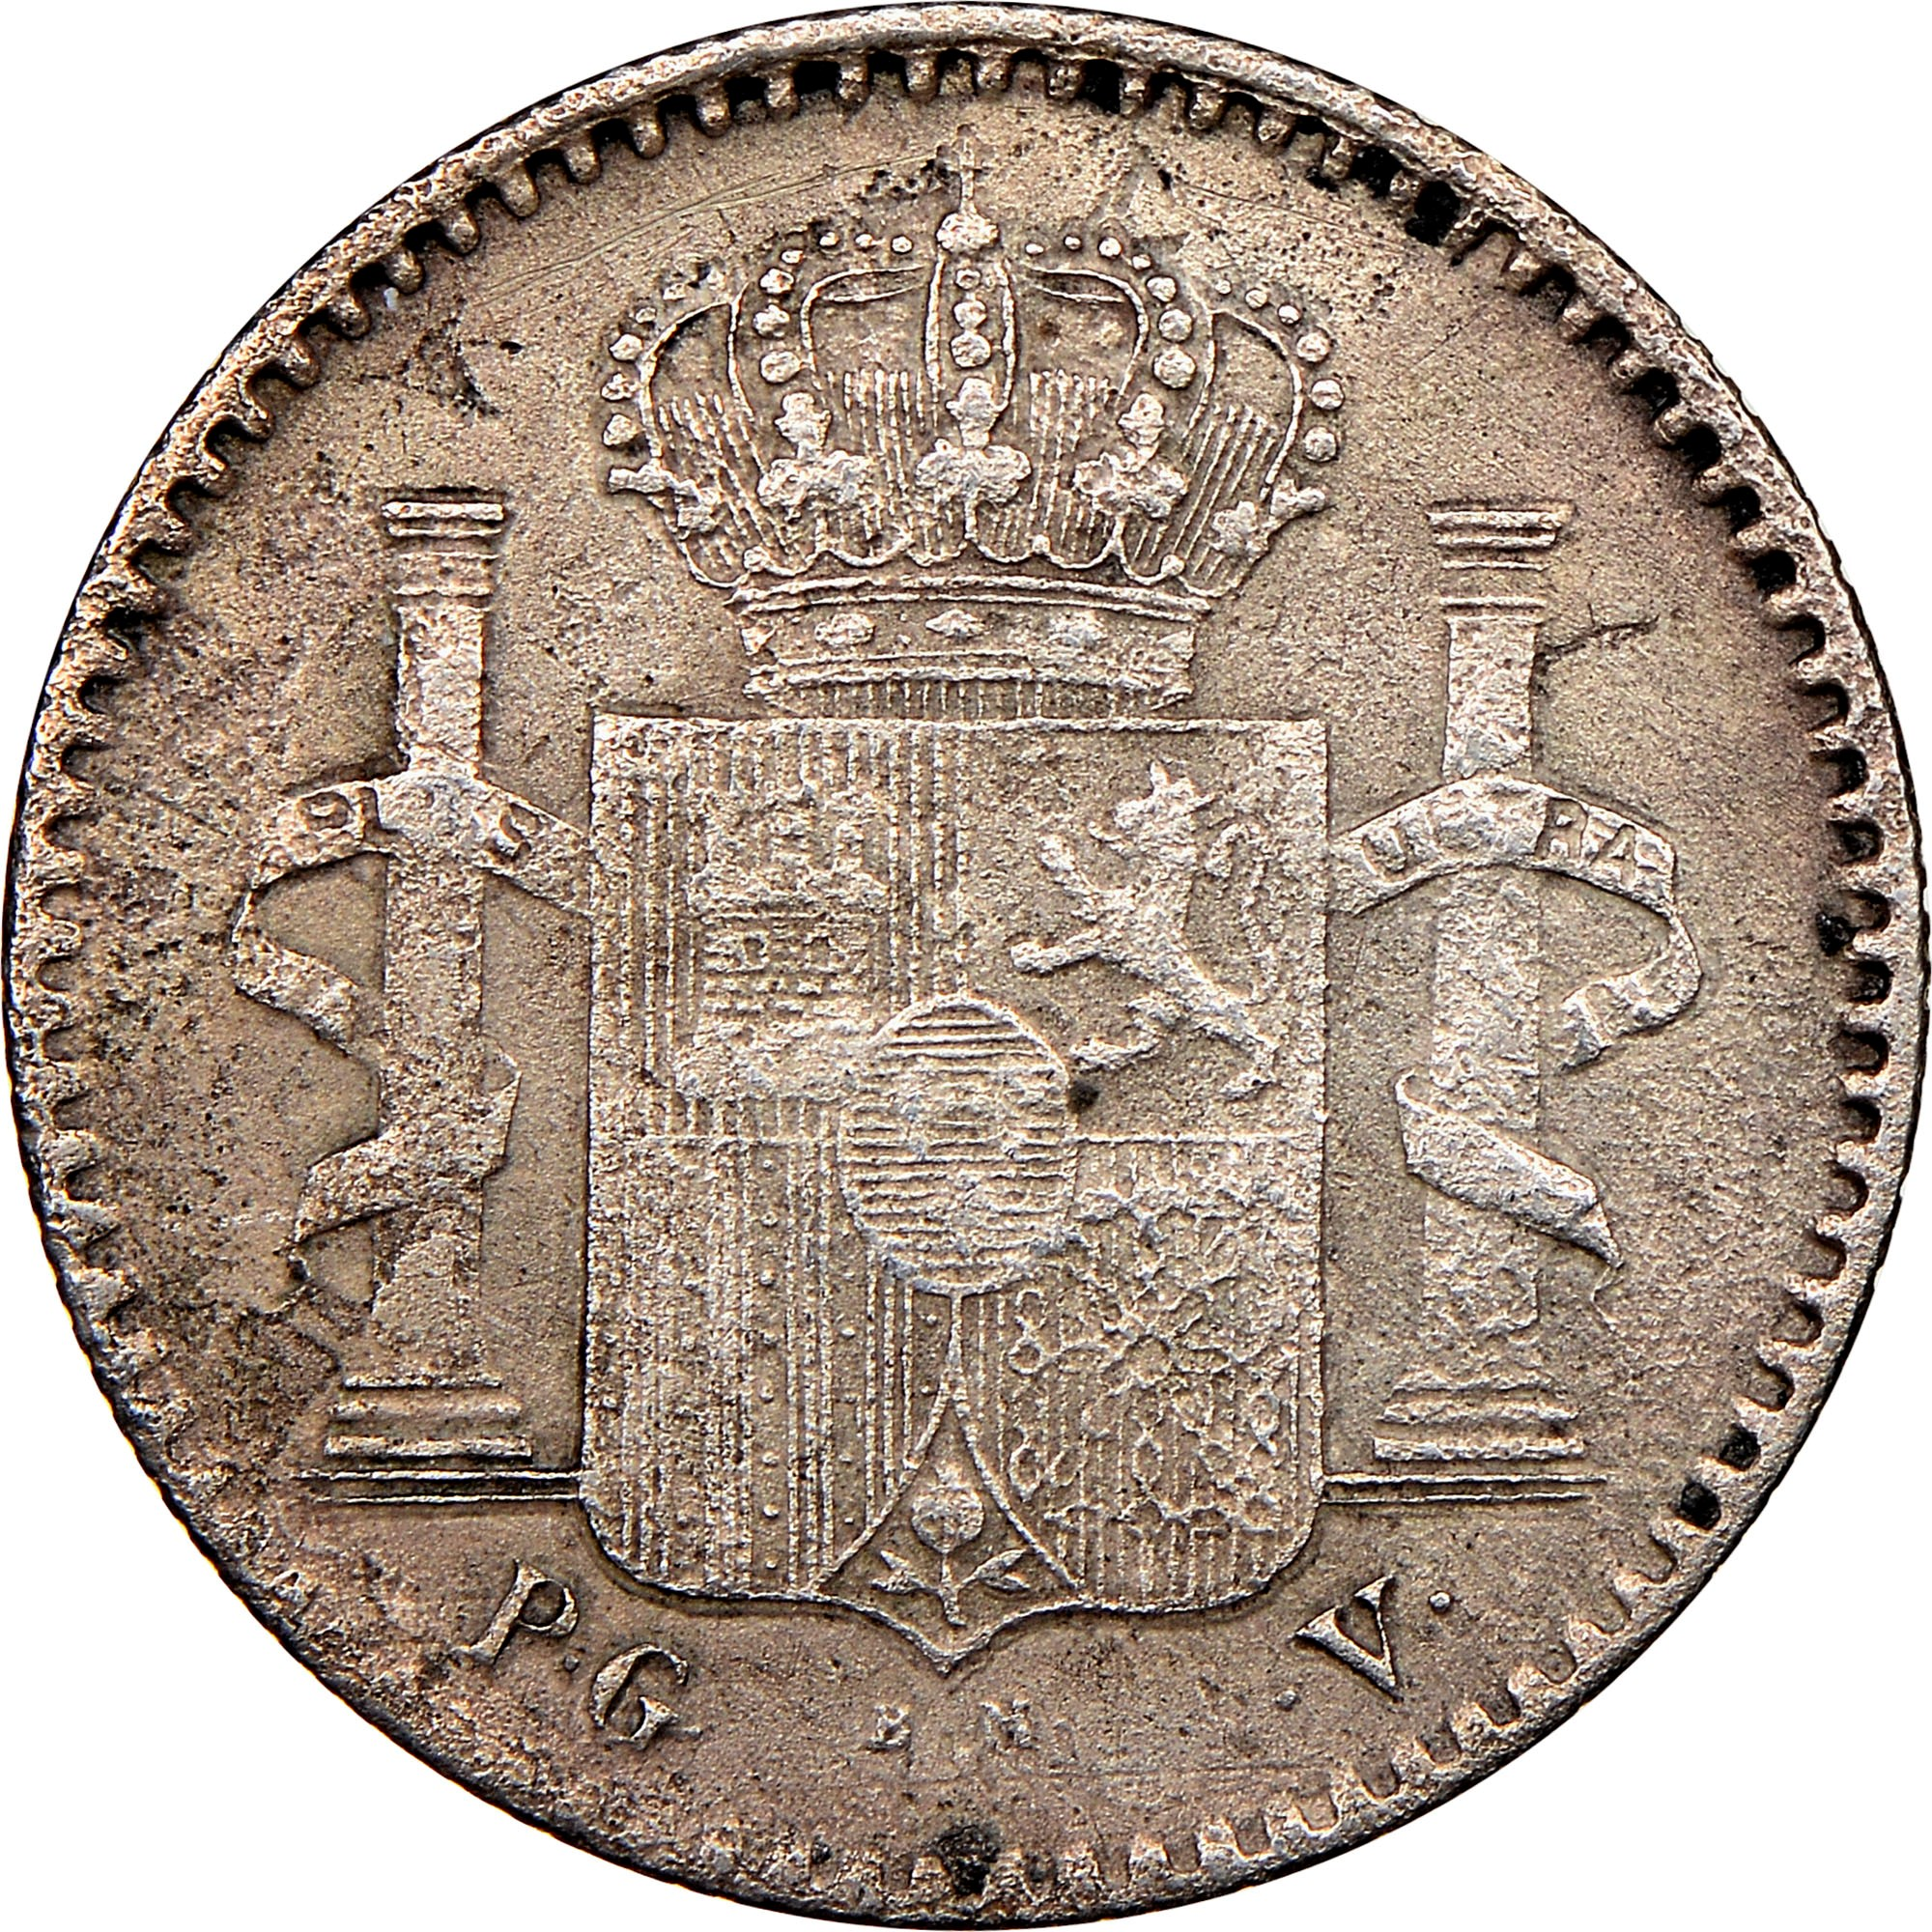 Puerto Rico 5 Centavos reverse